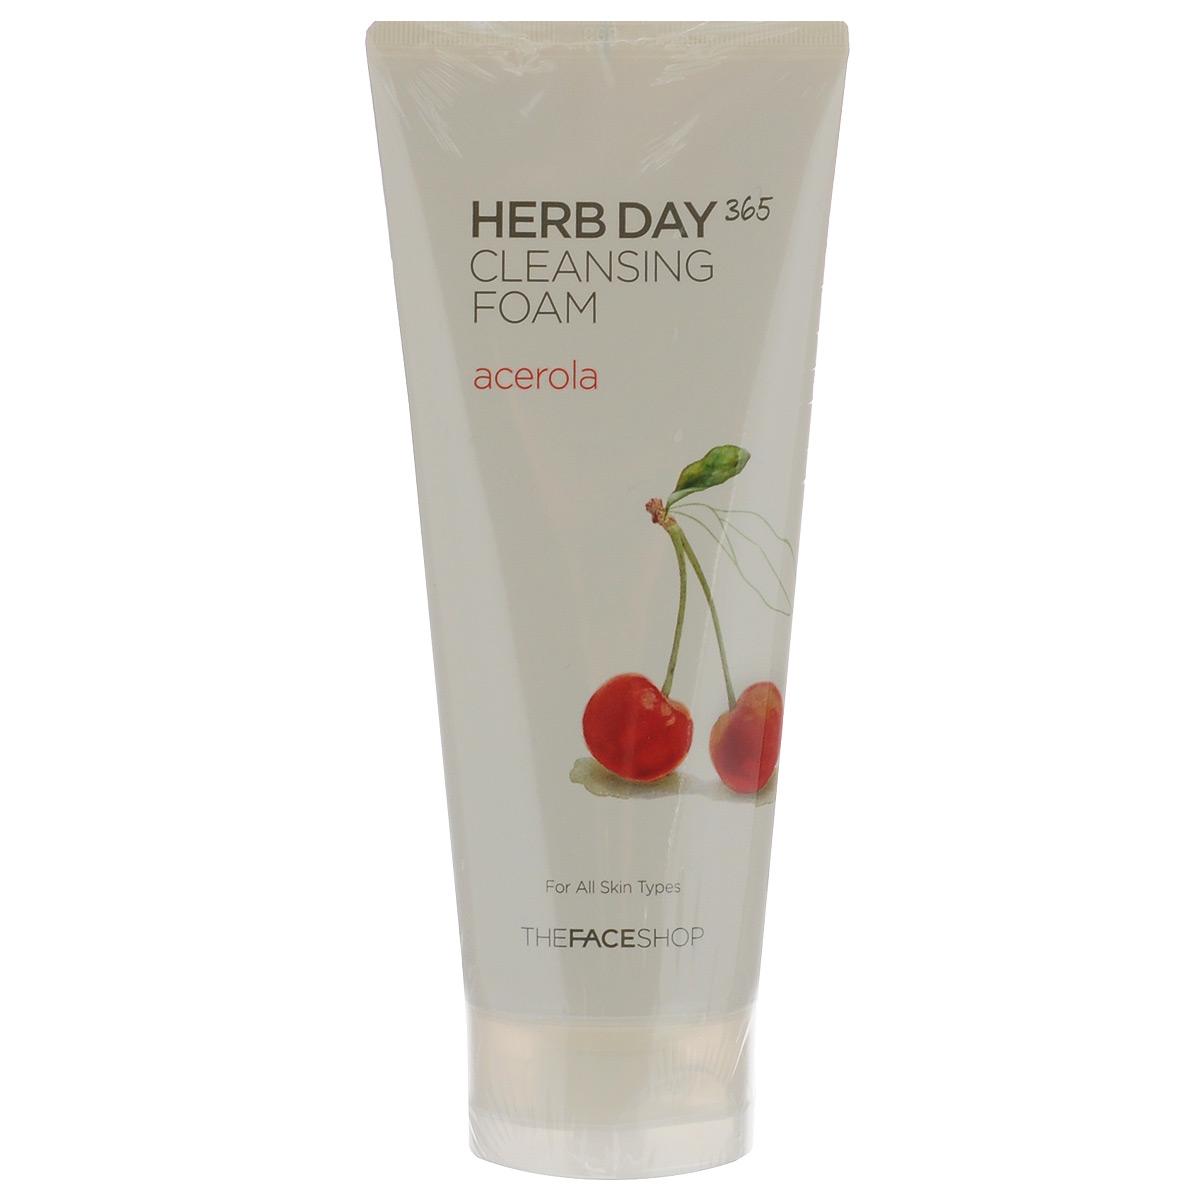 The Face Shop Пенка для умывания Herb Day 365, очищающая, с экстрактом ацеролы, для всех типов кожи, 170 мл пенка the face shop herb day 365 cleansing foam acerola объем 170 мл